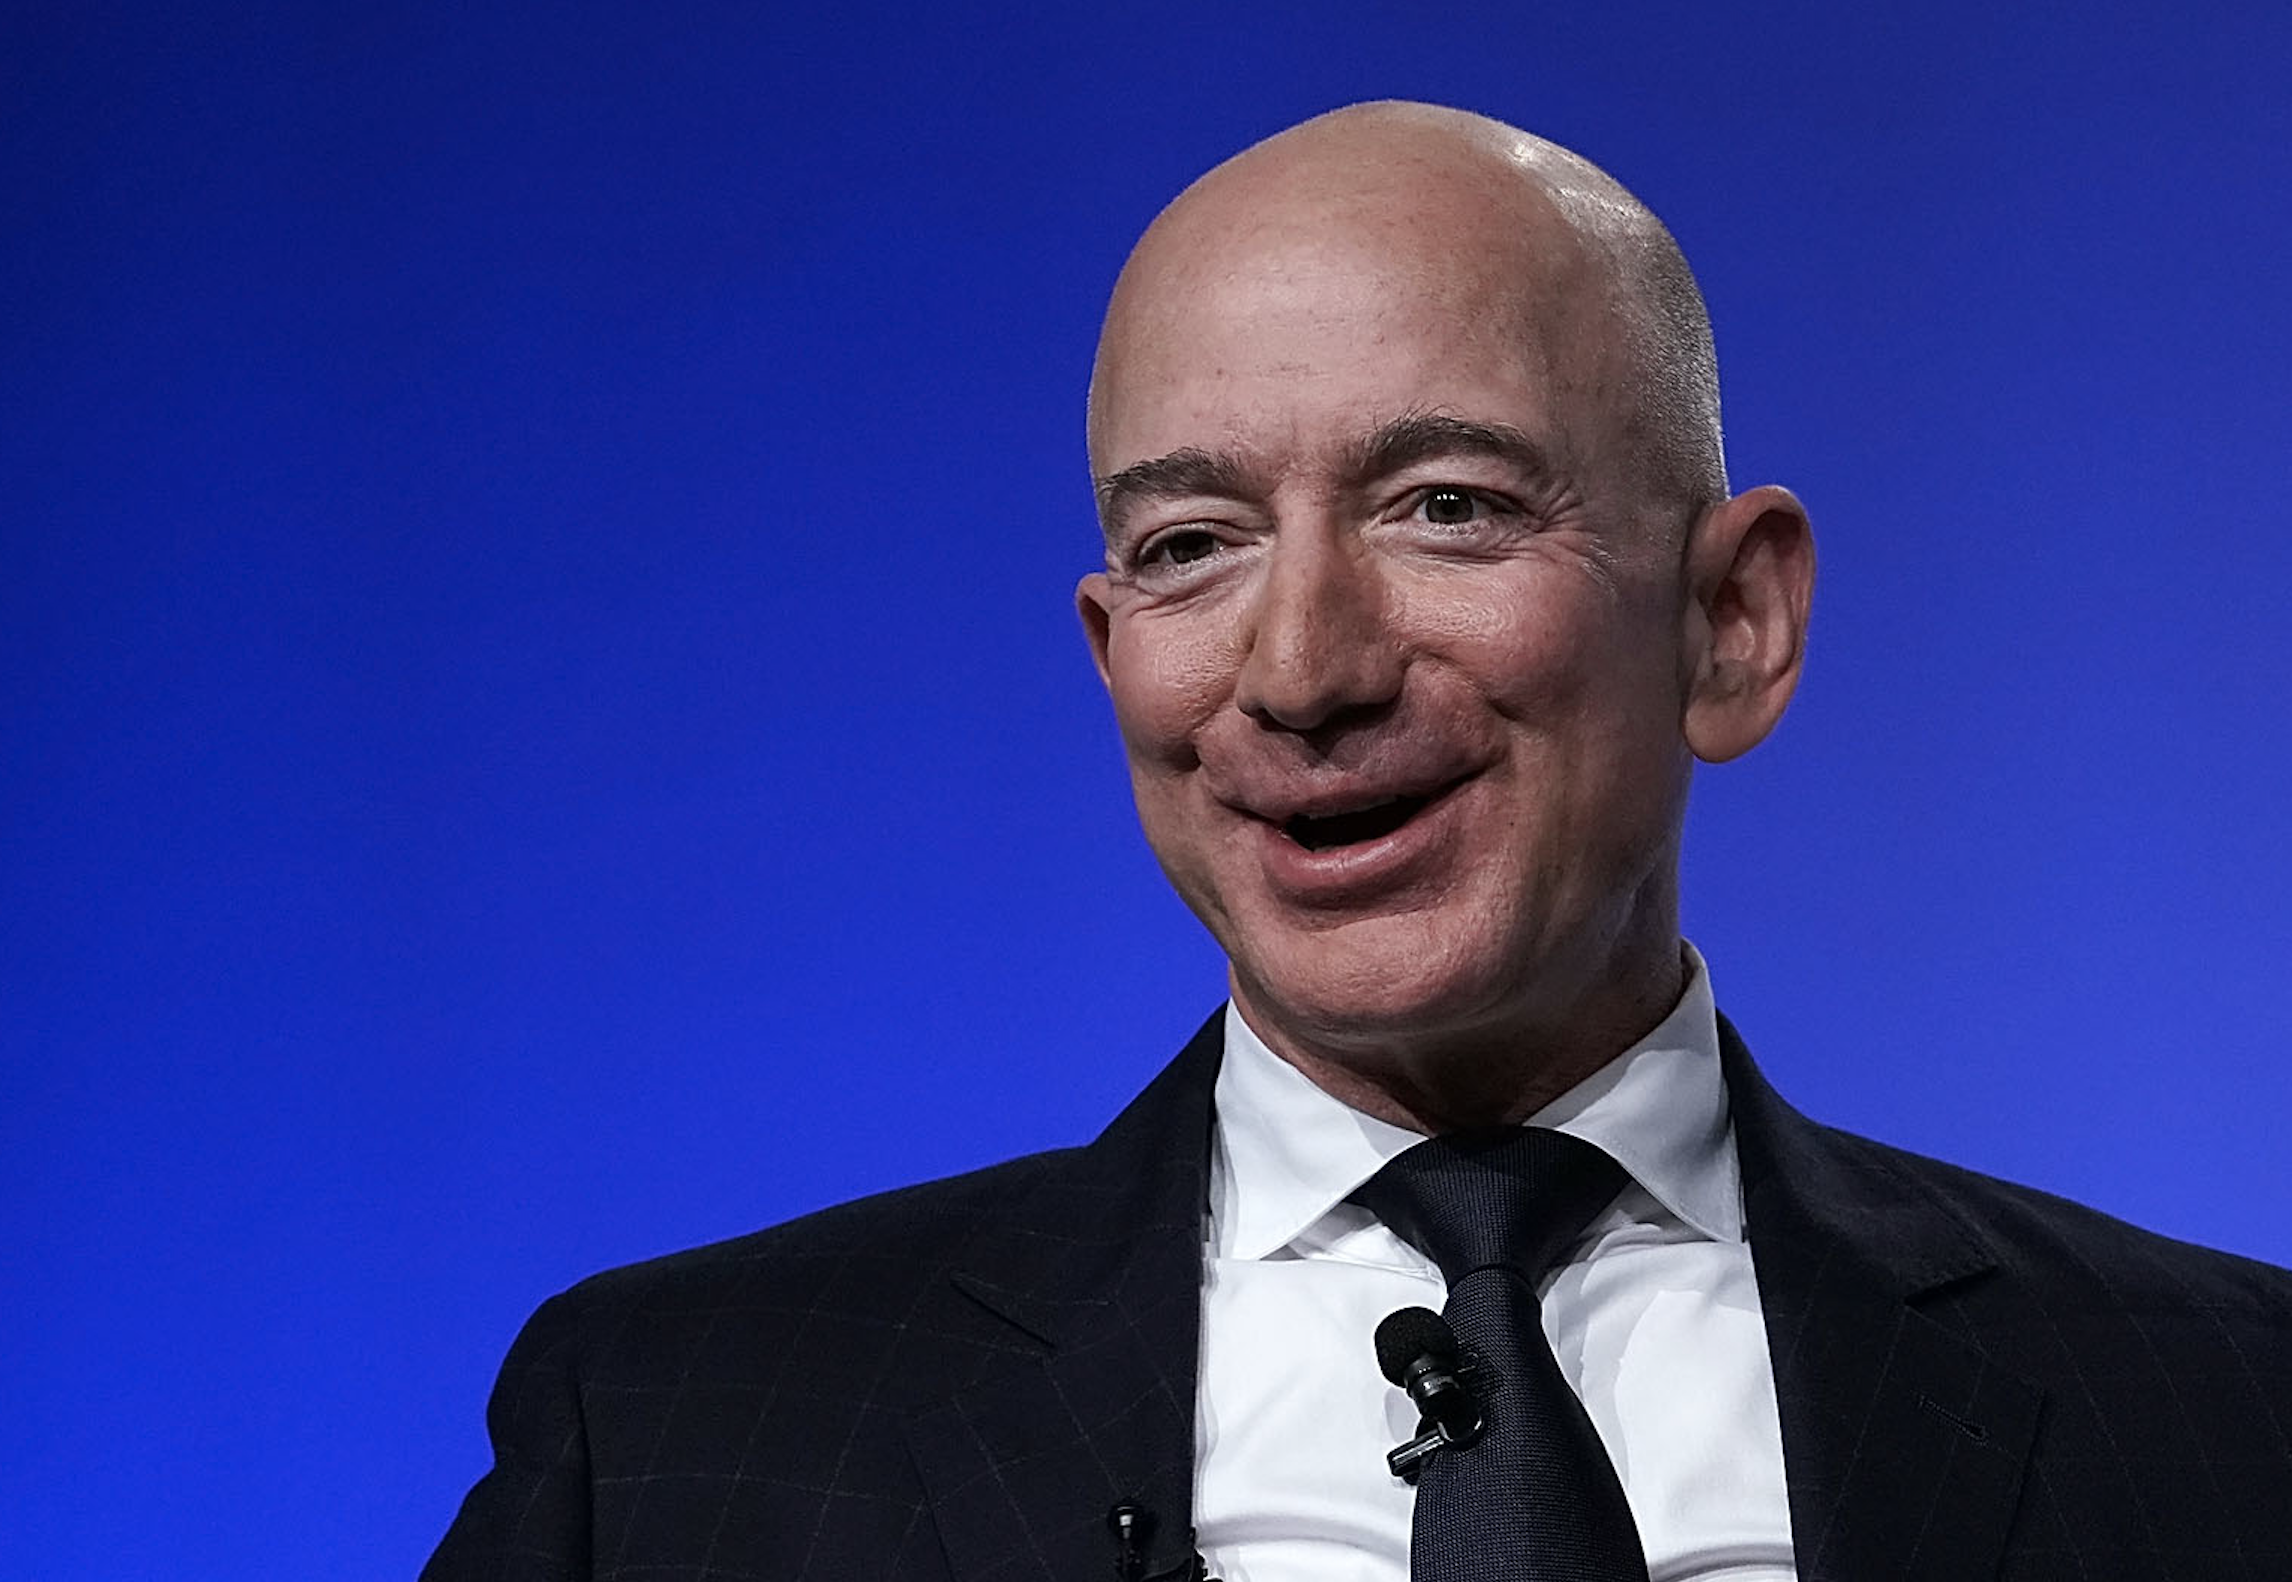 Amazon CEO Jeff Bezos quotes Dr. Seuss in letter to shareholders amid coronavirus